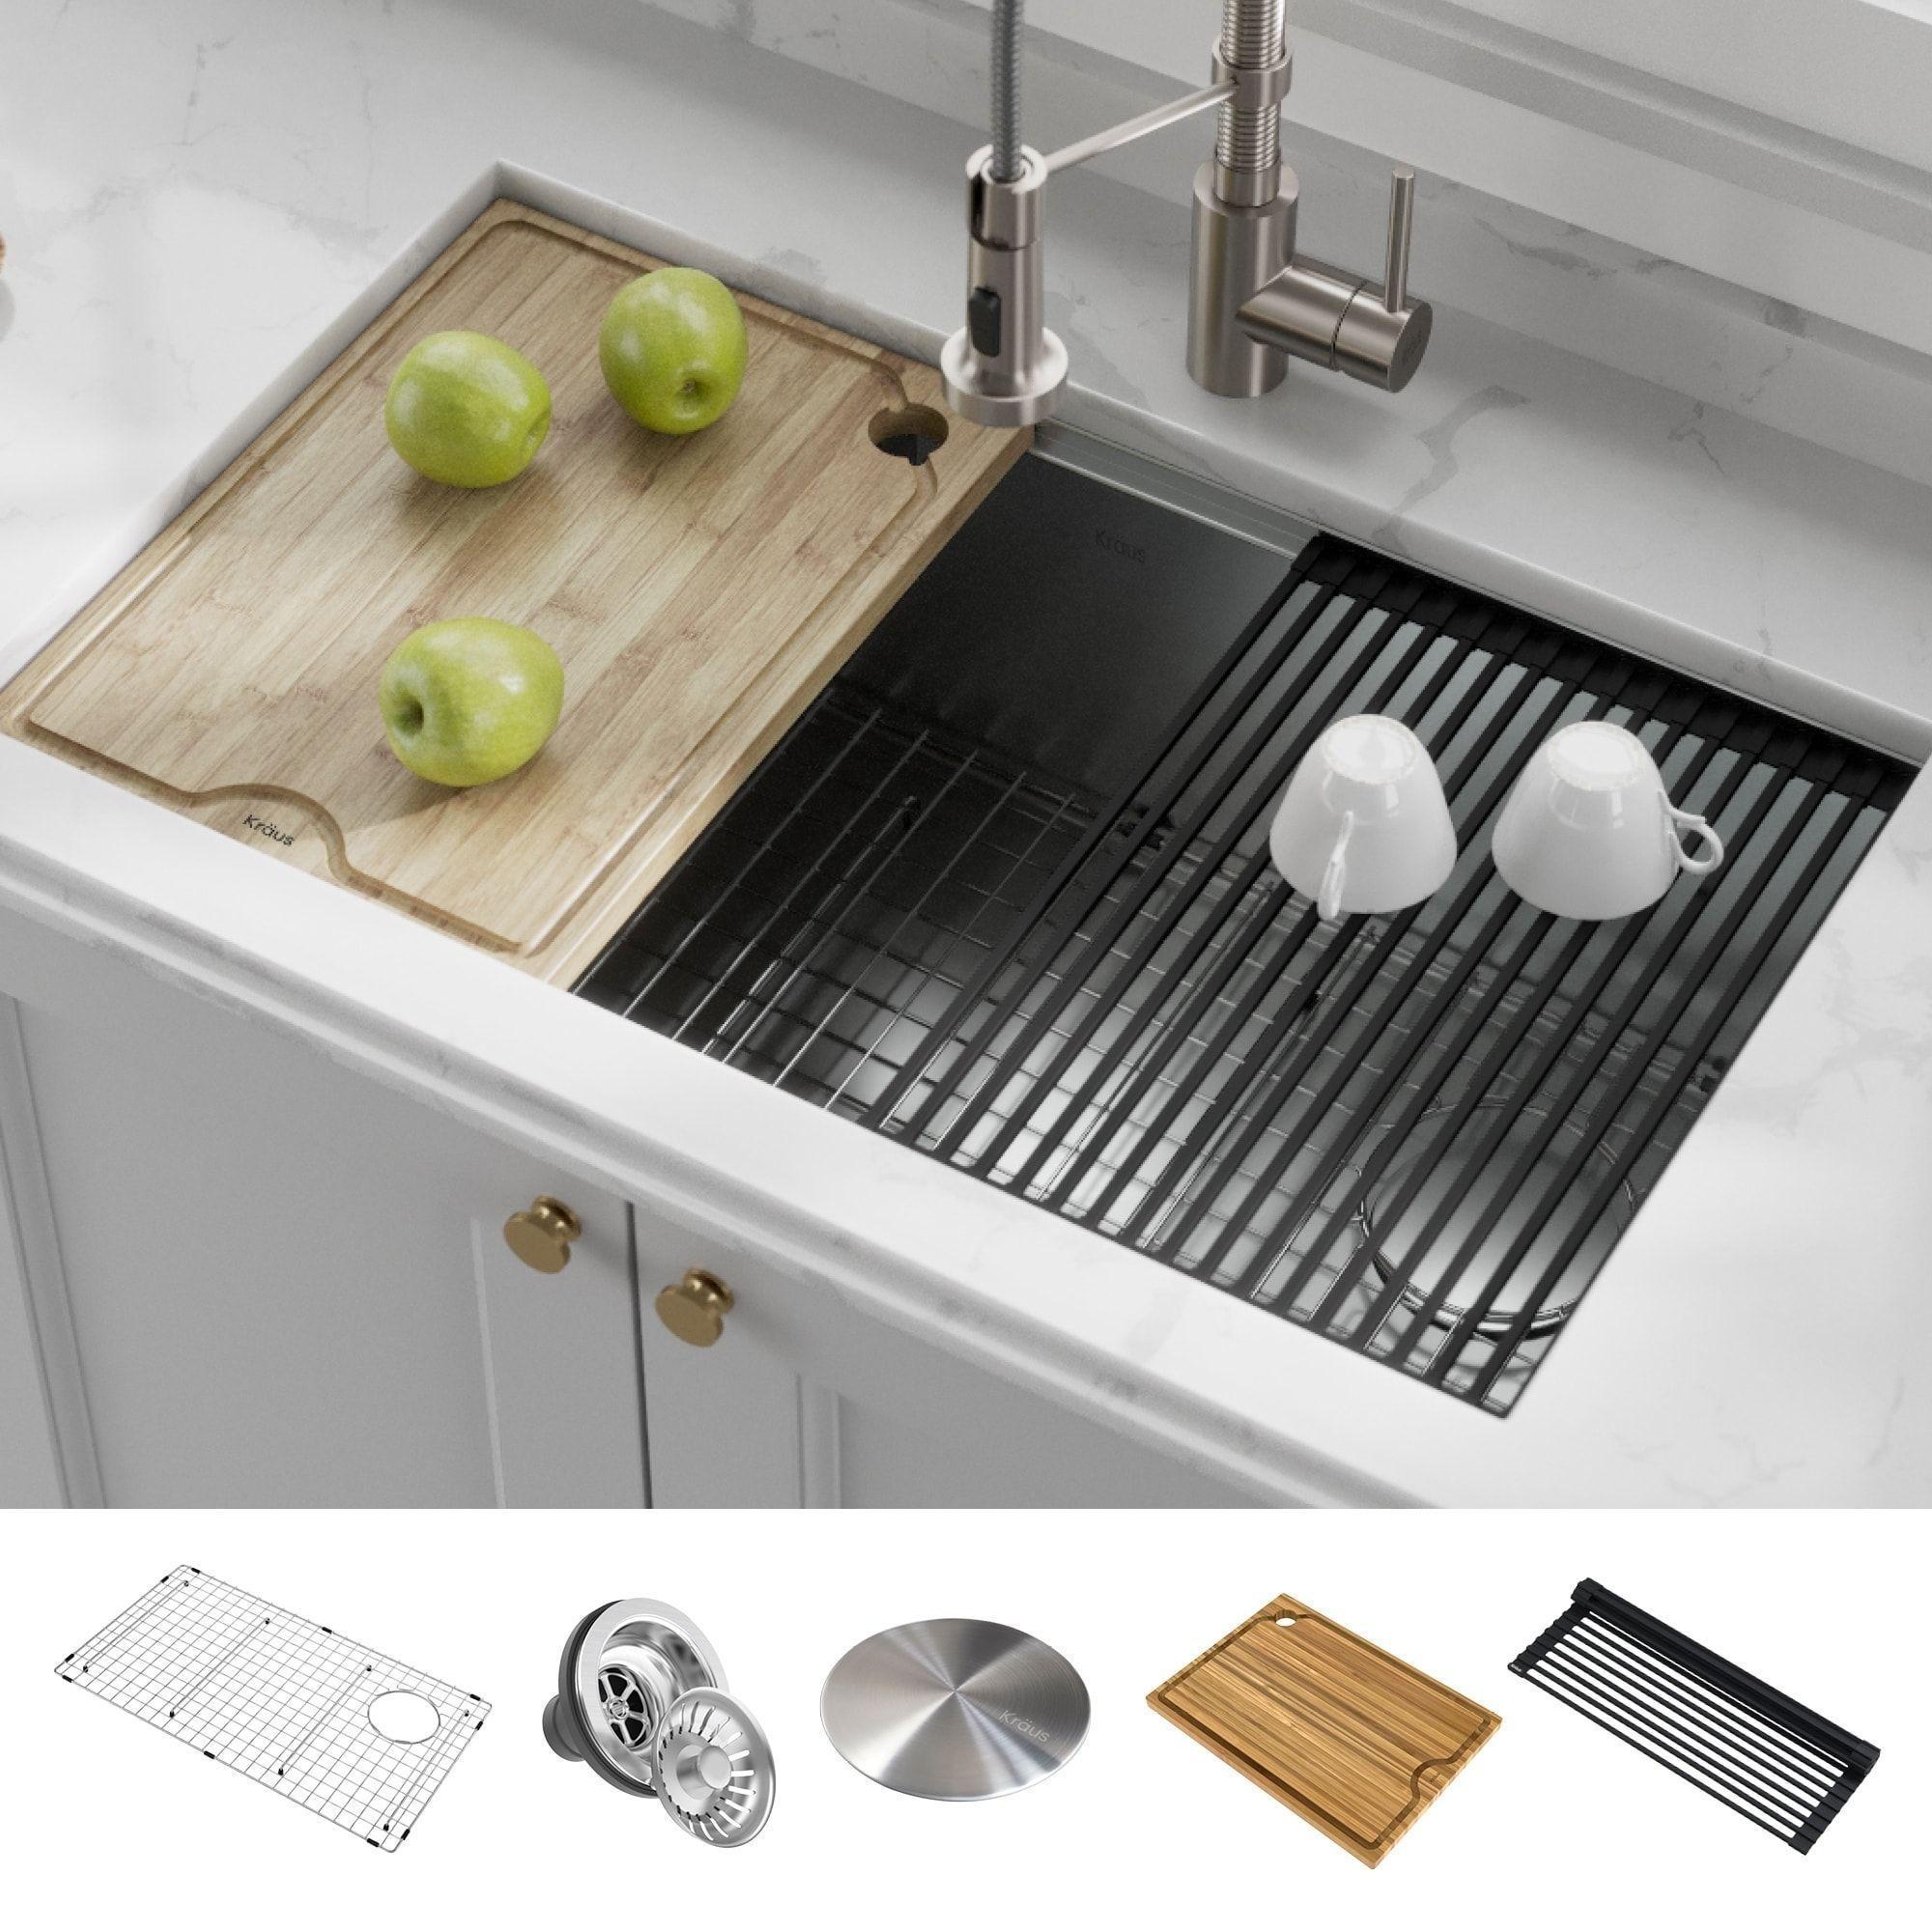 Kraus Kore Workstation Undermount Stainless Steel Kitchen Sink Single Bowl Overall Size 23 Inch L X 19 Inch W Gray In 2020 Single Bowl Kitchen Sink Steel Kitchen Sink Stainless Steel Kitchen